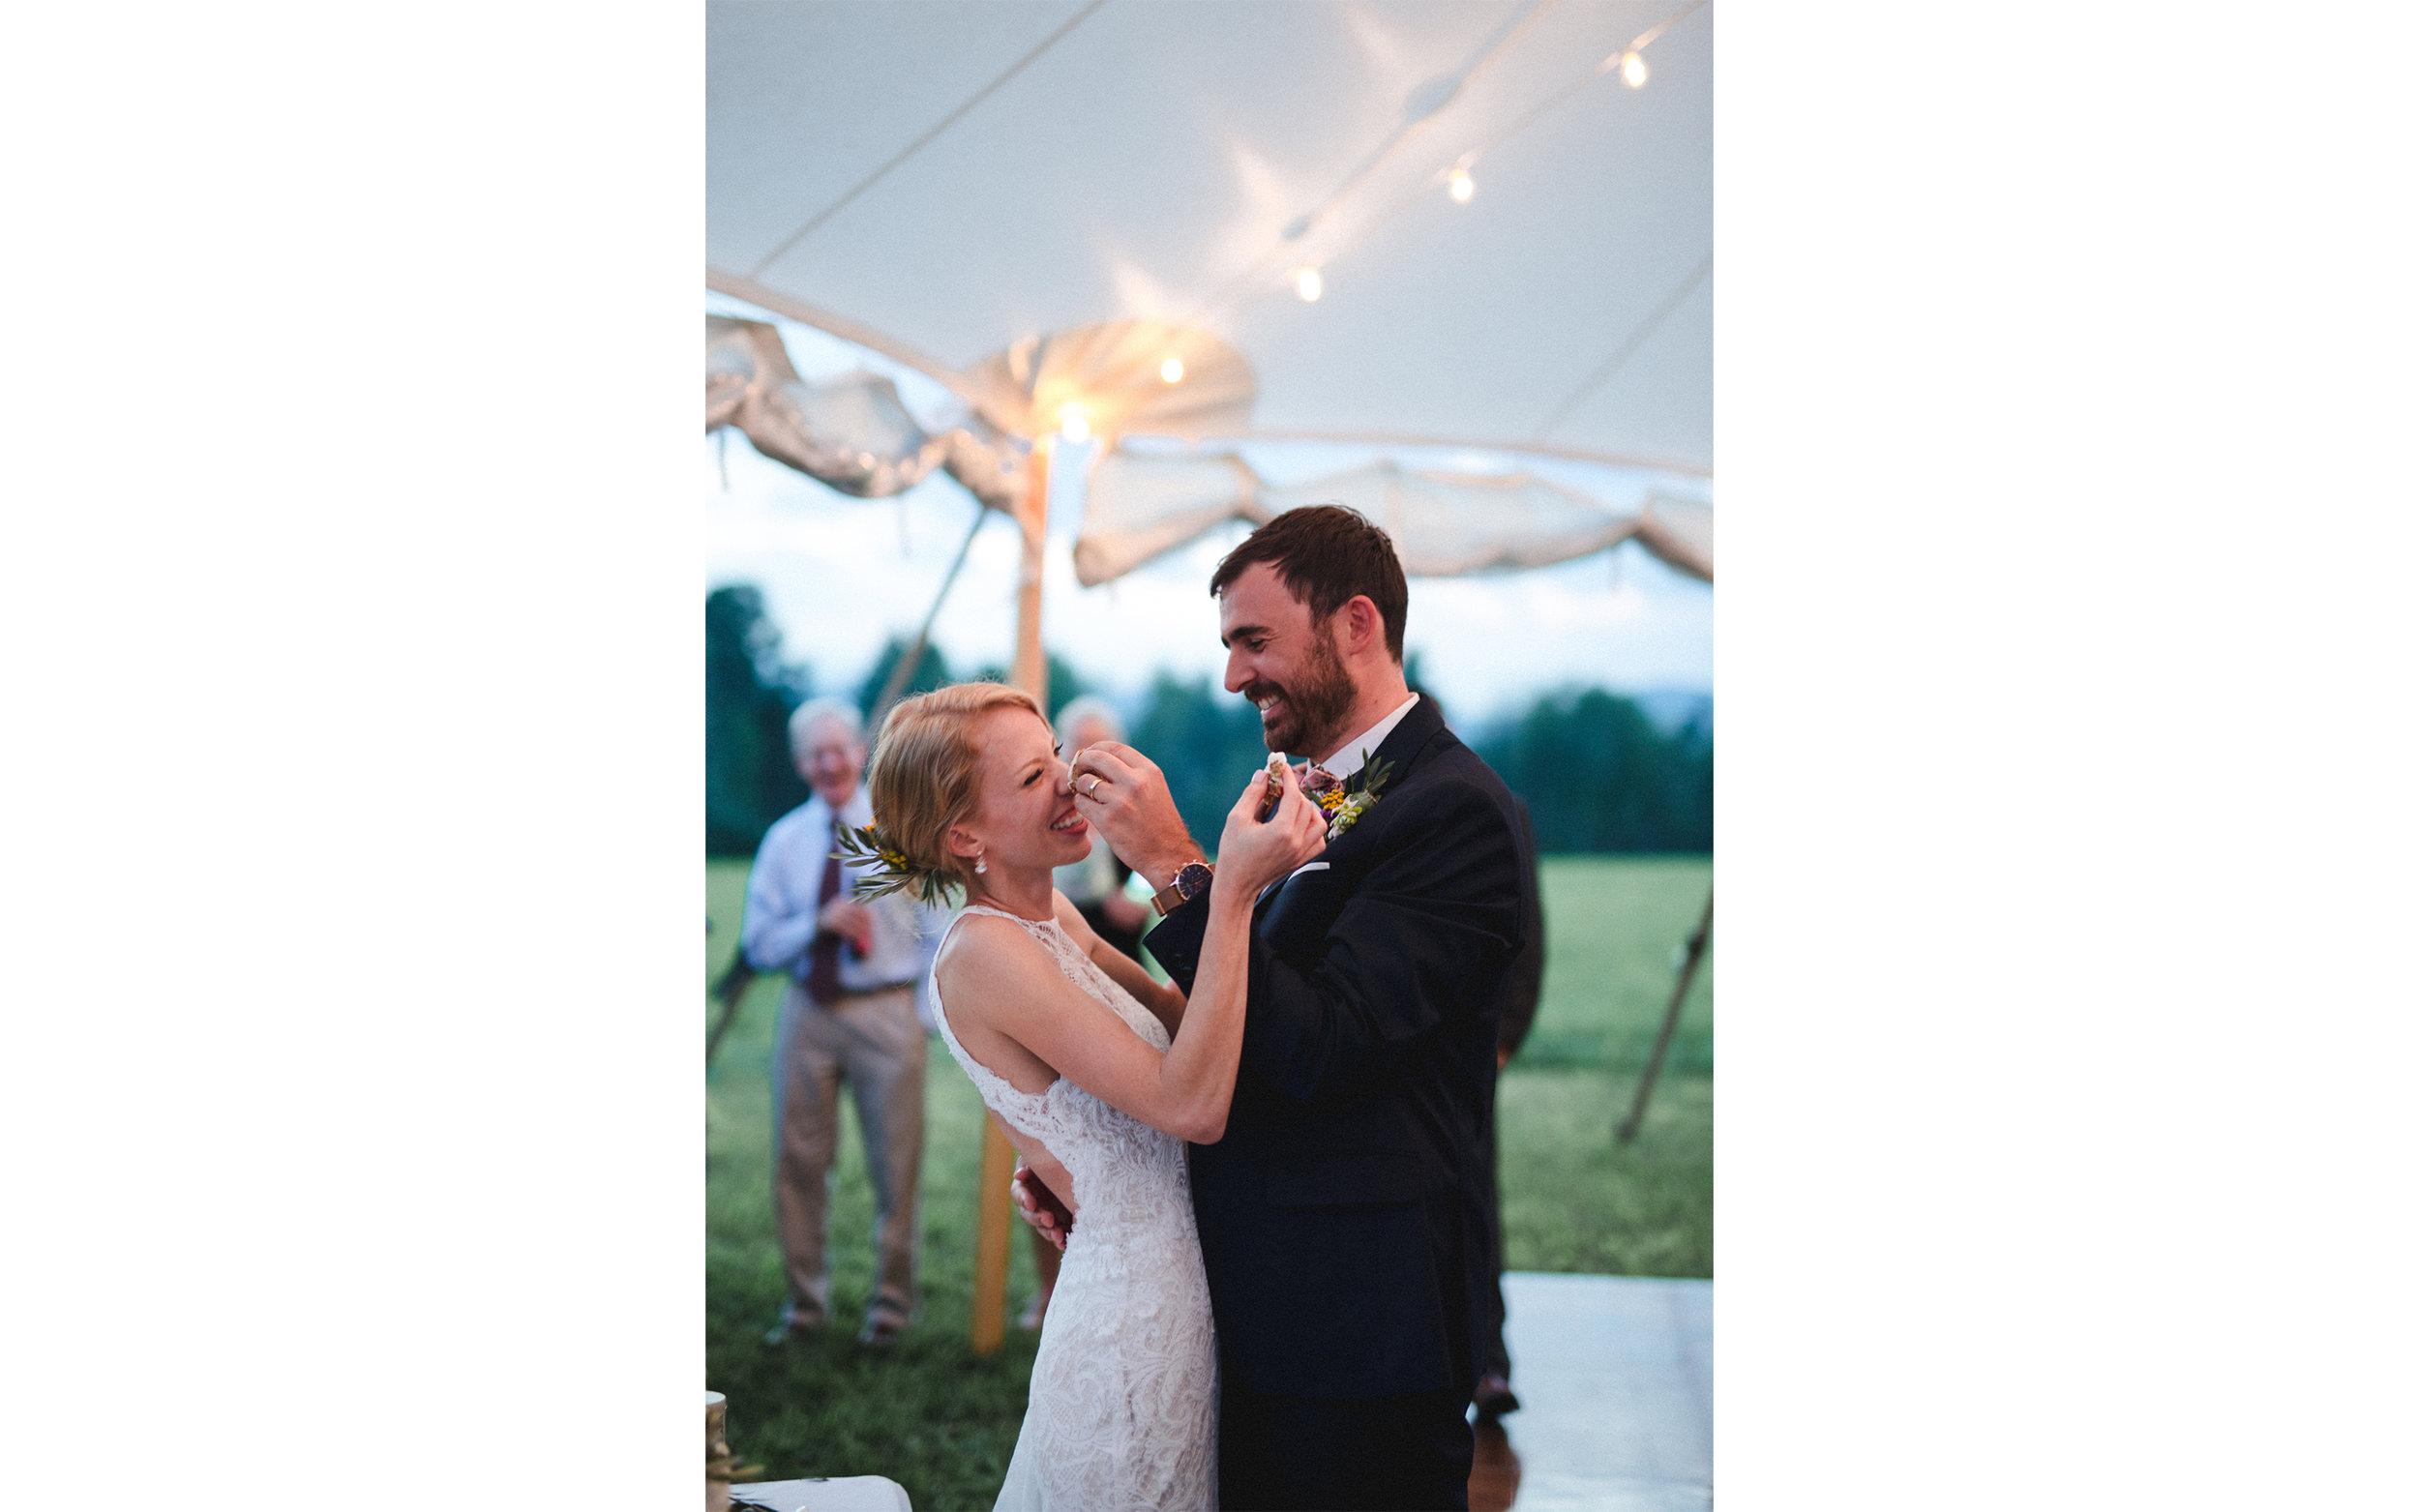 Stowe VT Farm Wedding Fine Art Wedding Photographer_Meg Haley Photographs_074.jpg